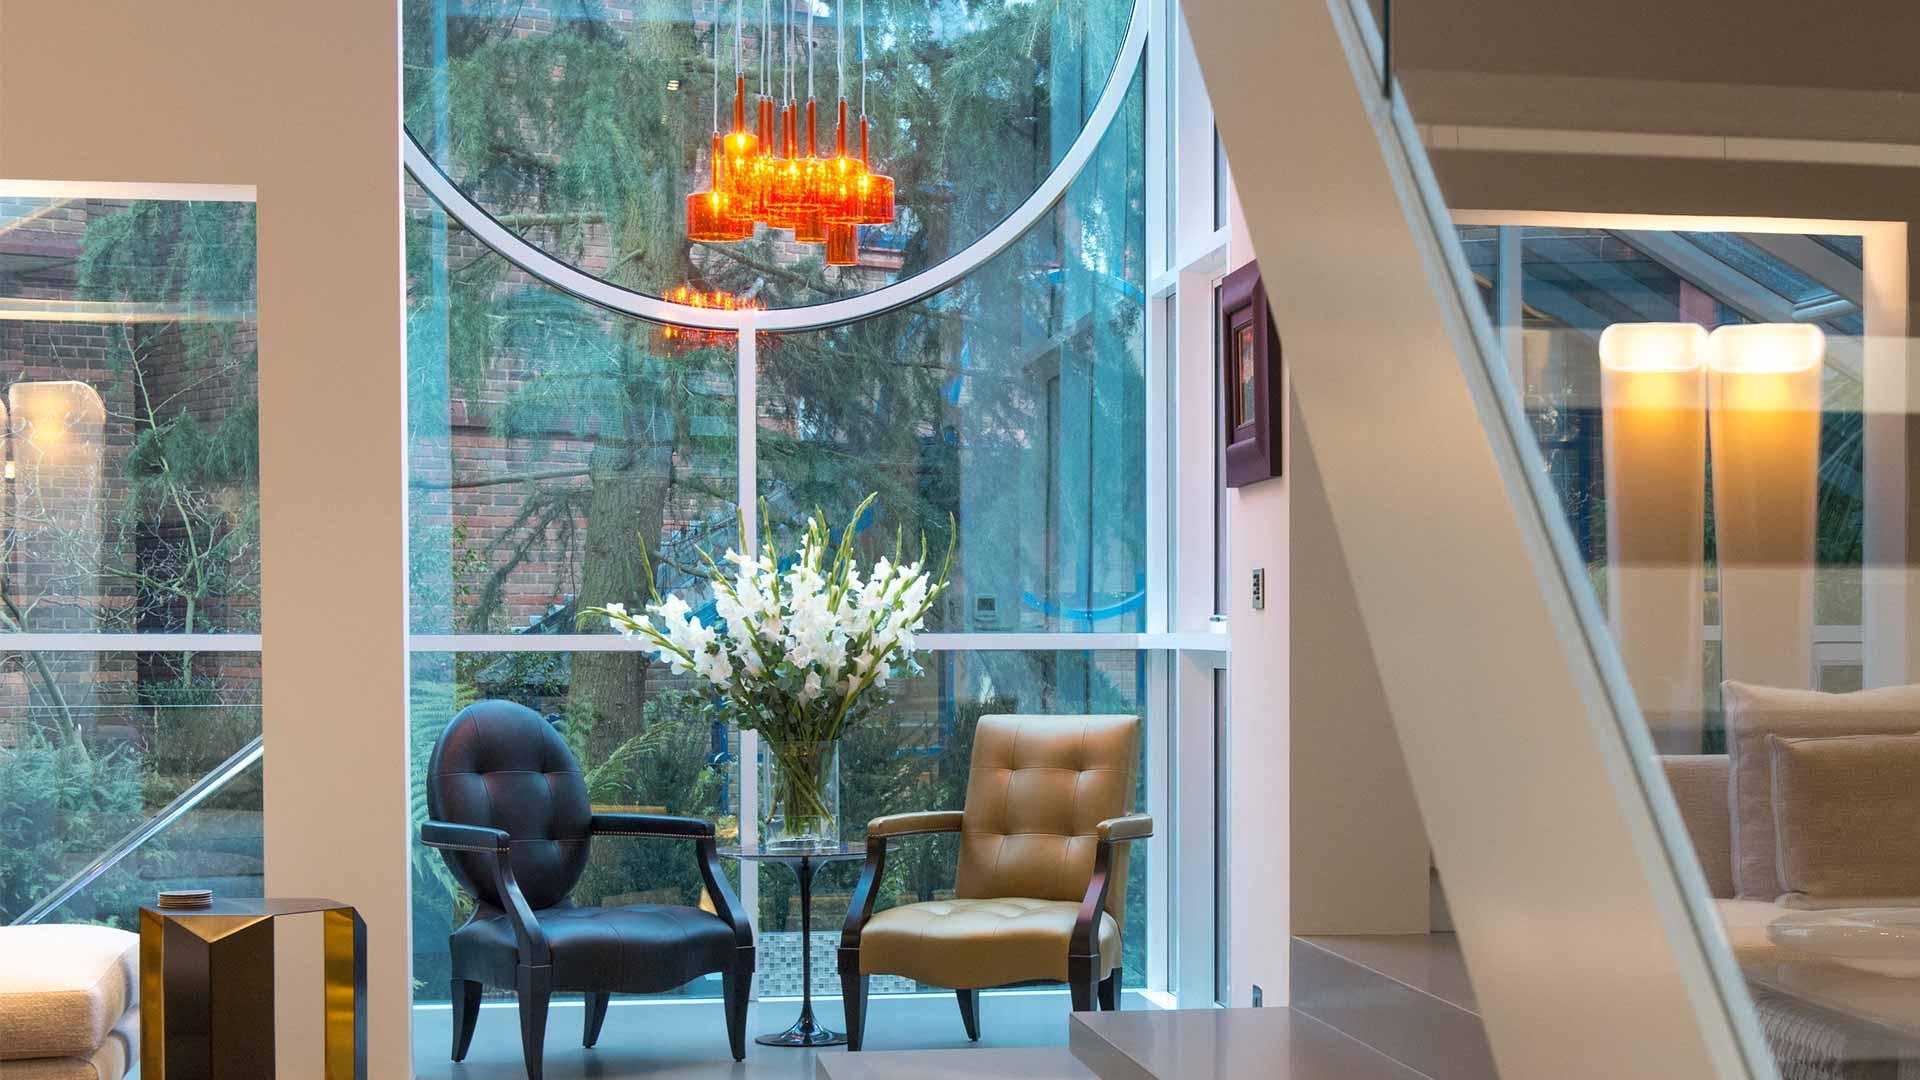 Interior Lighting Design Scheme Home Glass Front Exterior Orange Pendants Consultants Nulty